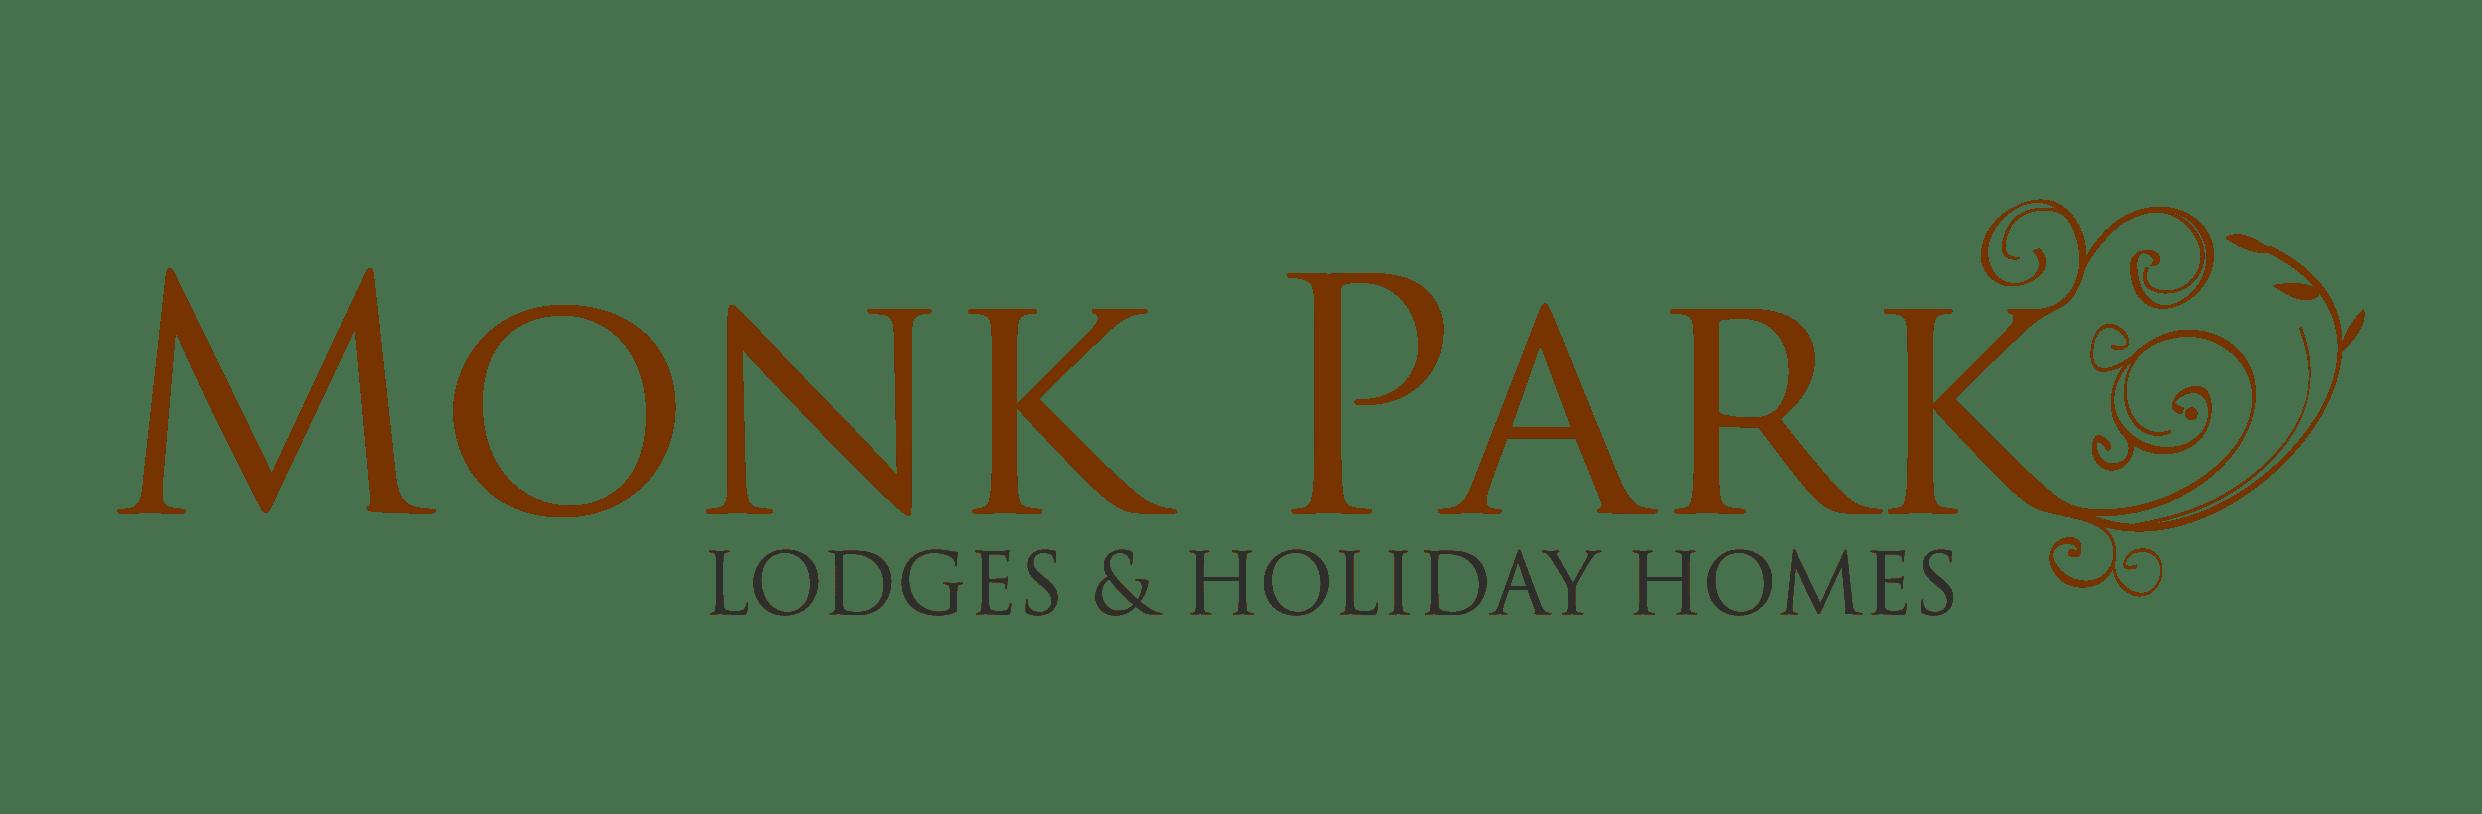 Monk Park Logo